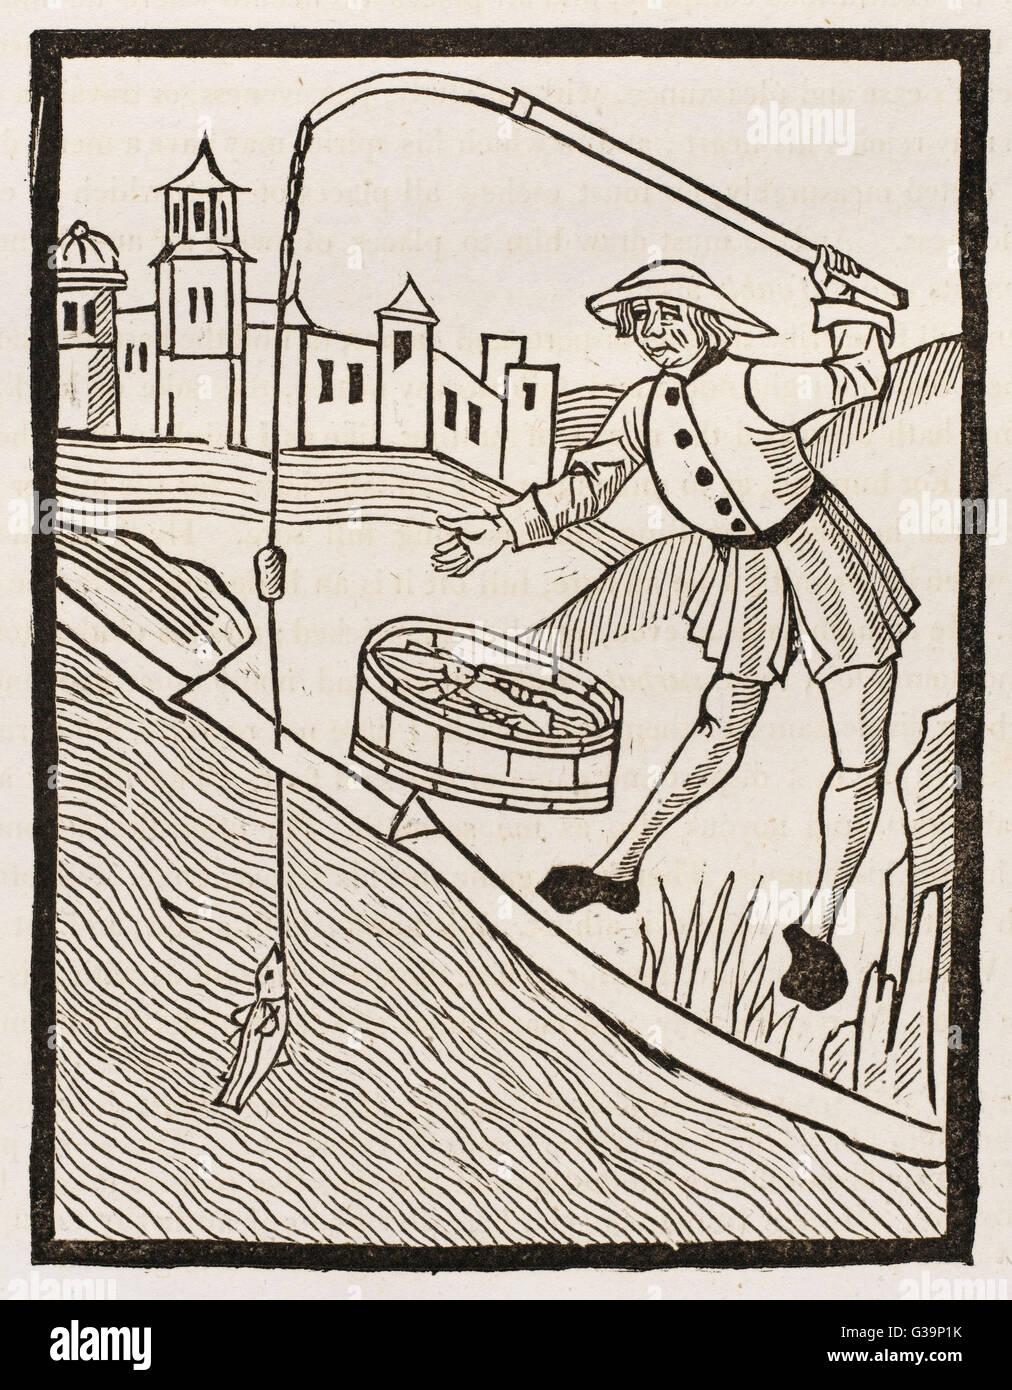 A fifteenth century angler  makes a catch - illustration in Wynkyn de  Worde's 'Treatyse of Fysshynge  with - Stock Image